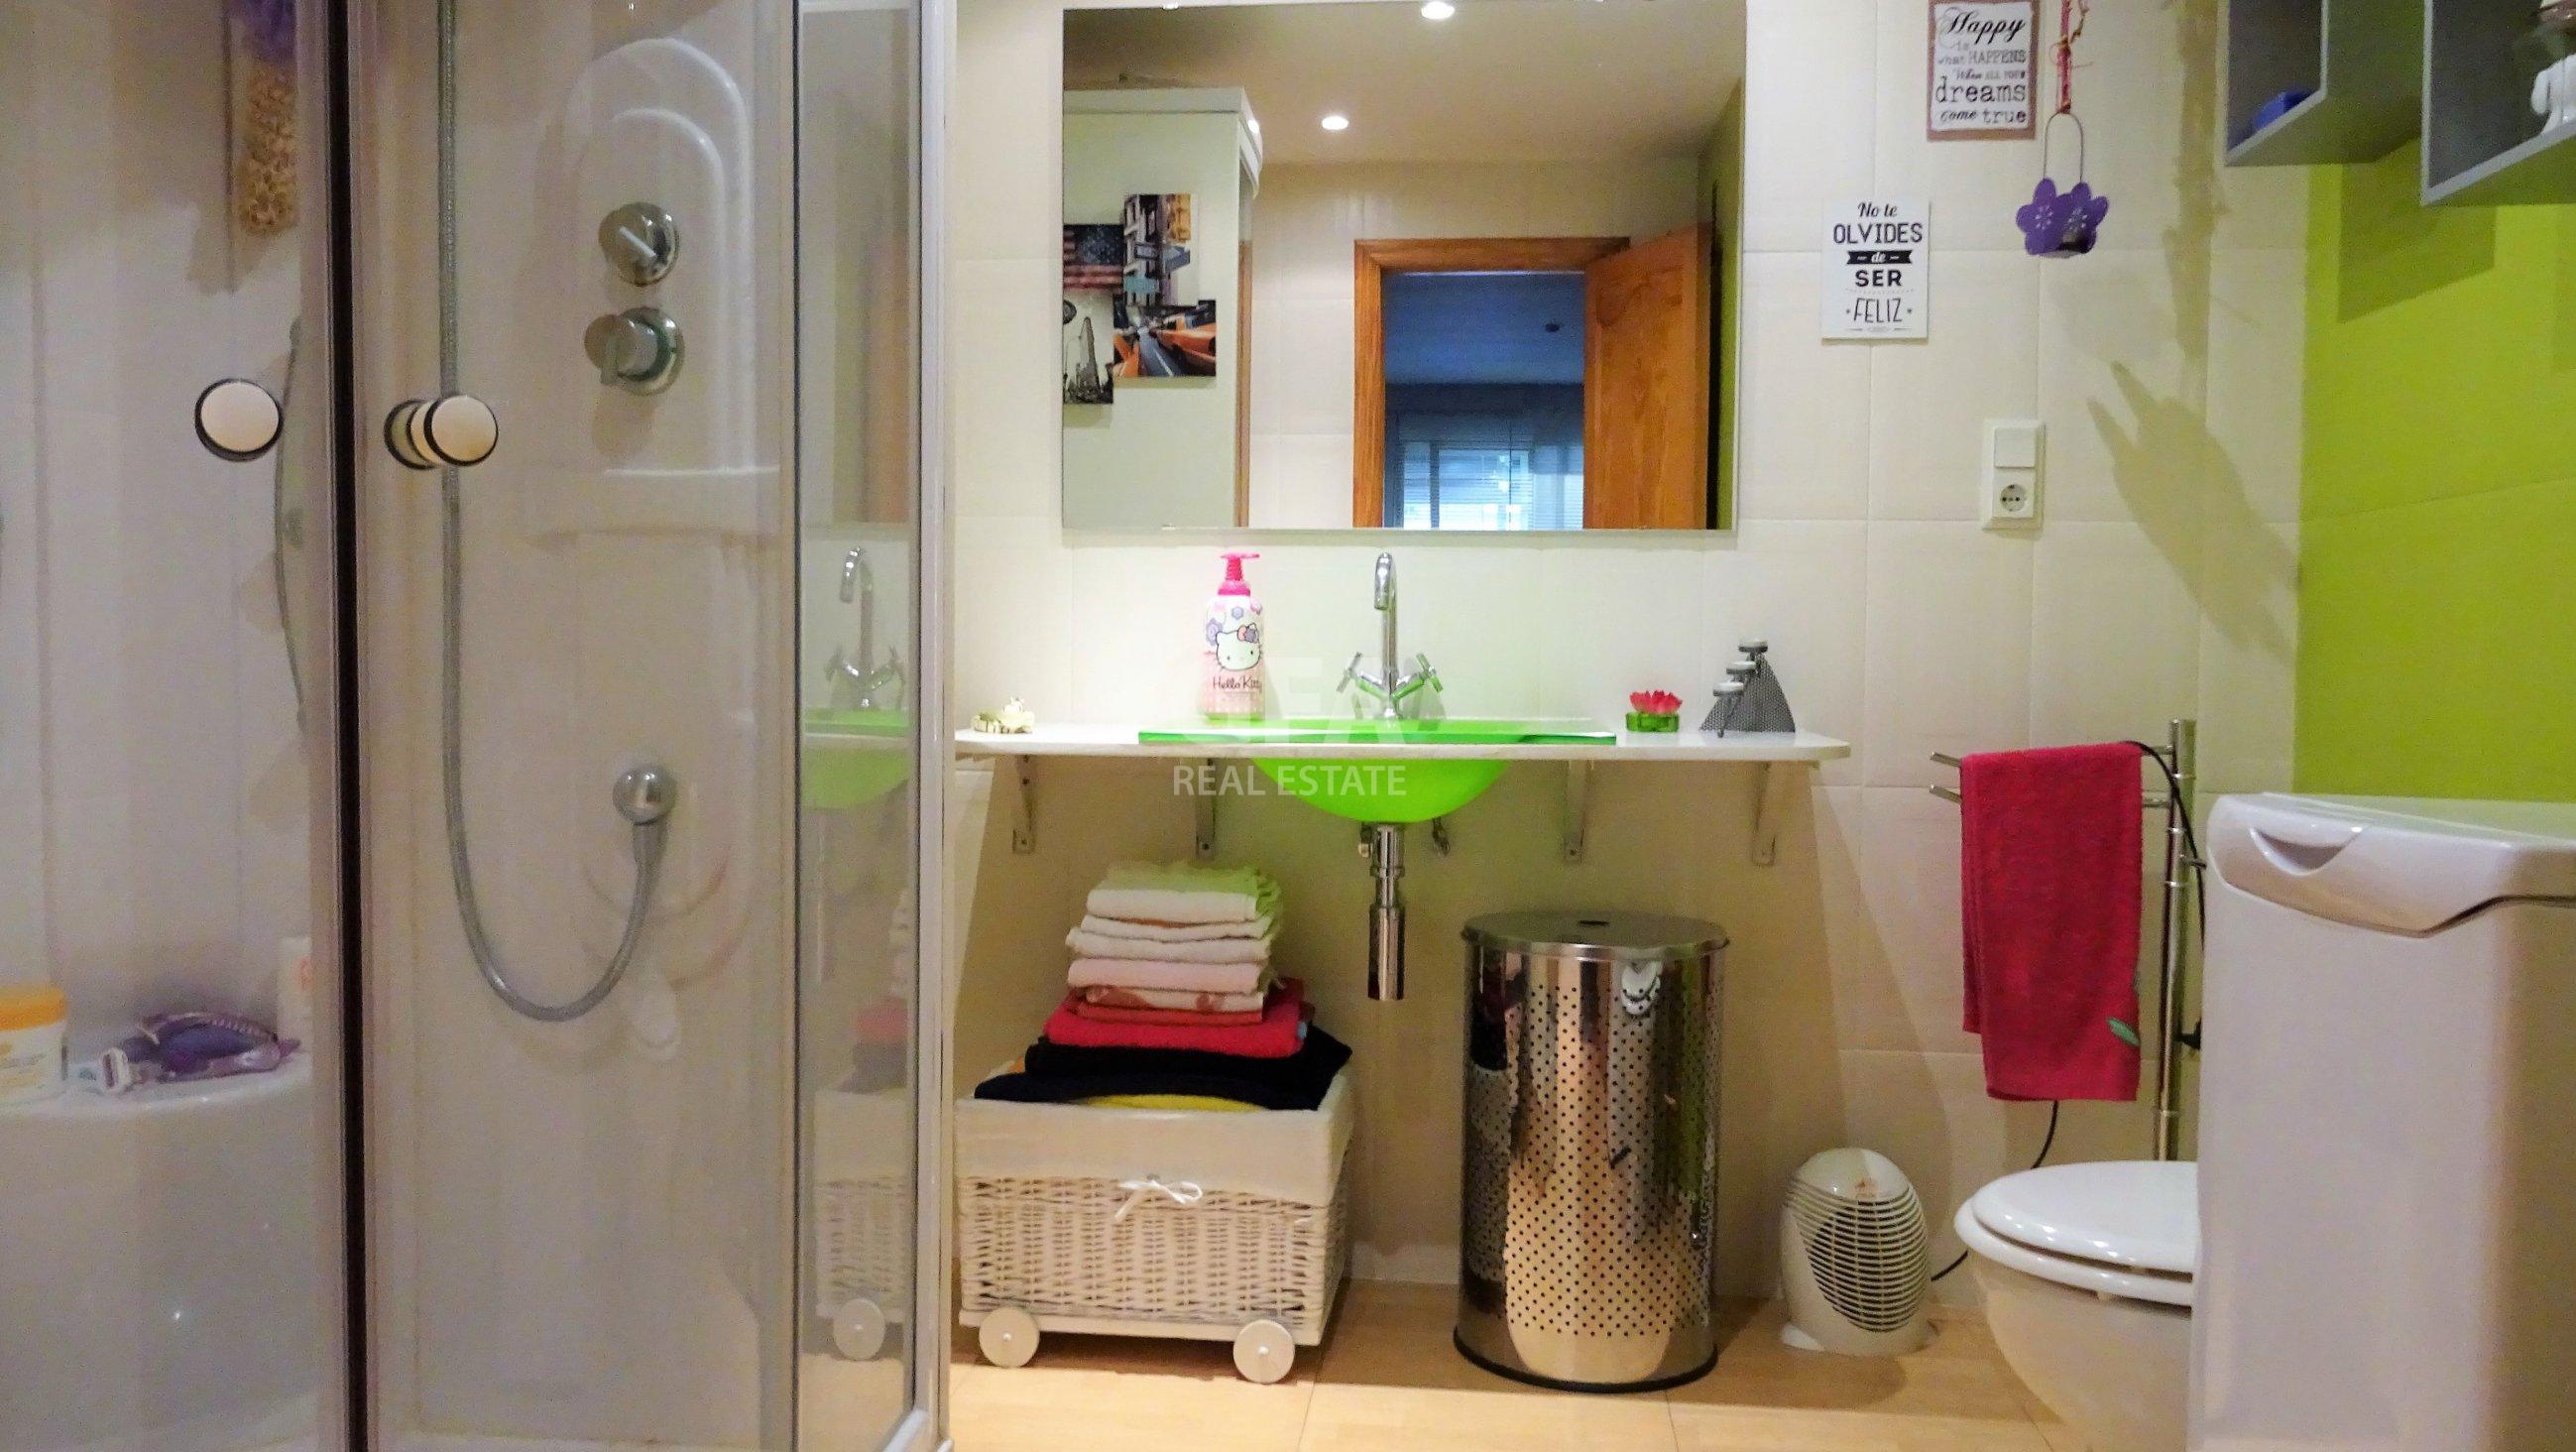 Piso en Gandía zona Corea baño equipado